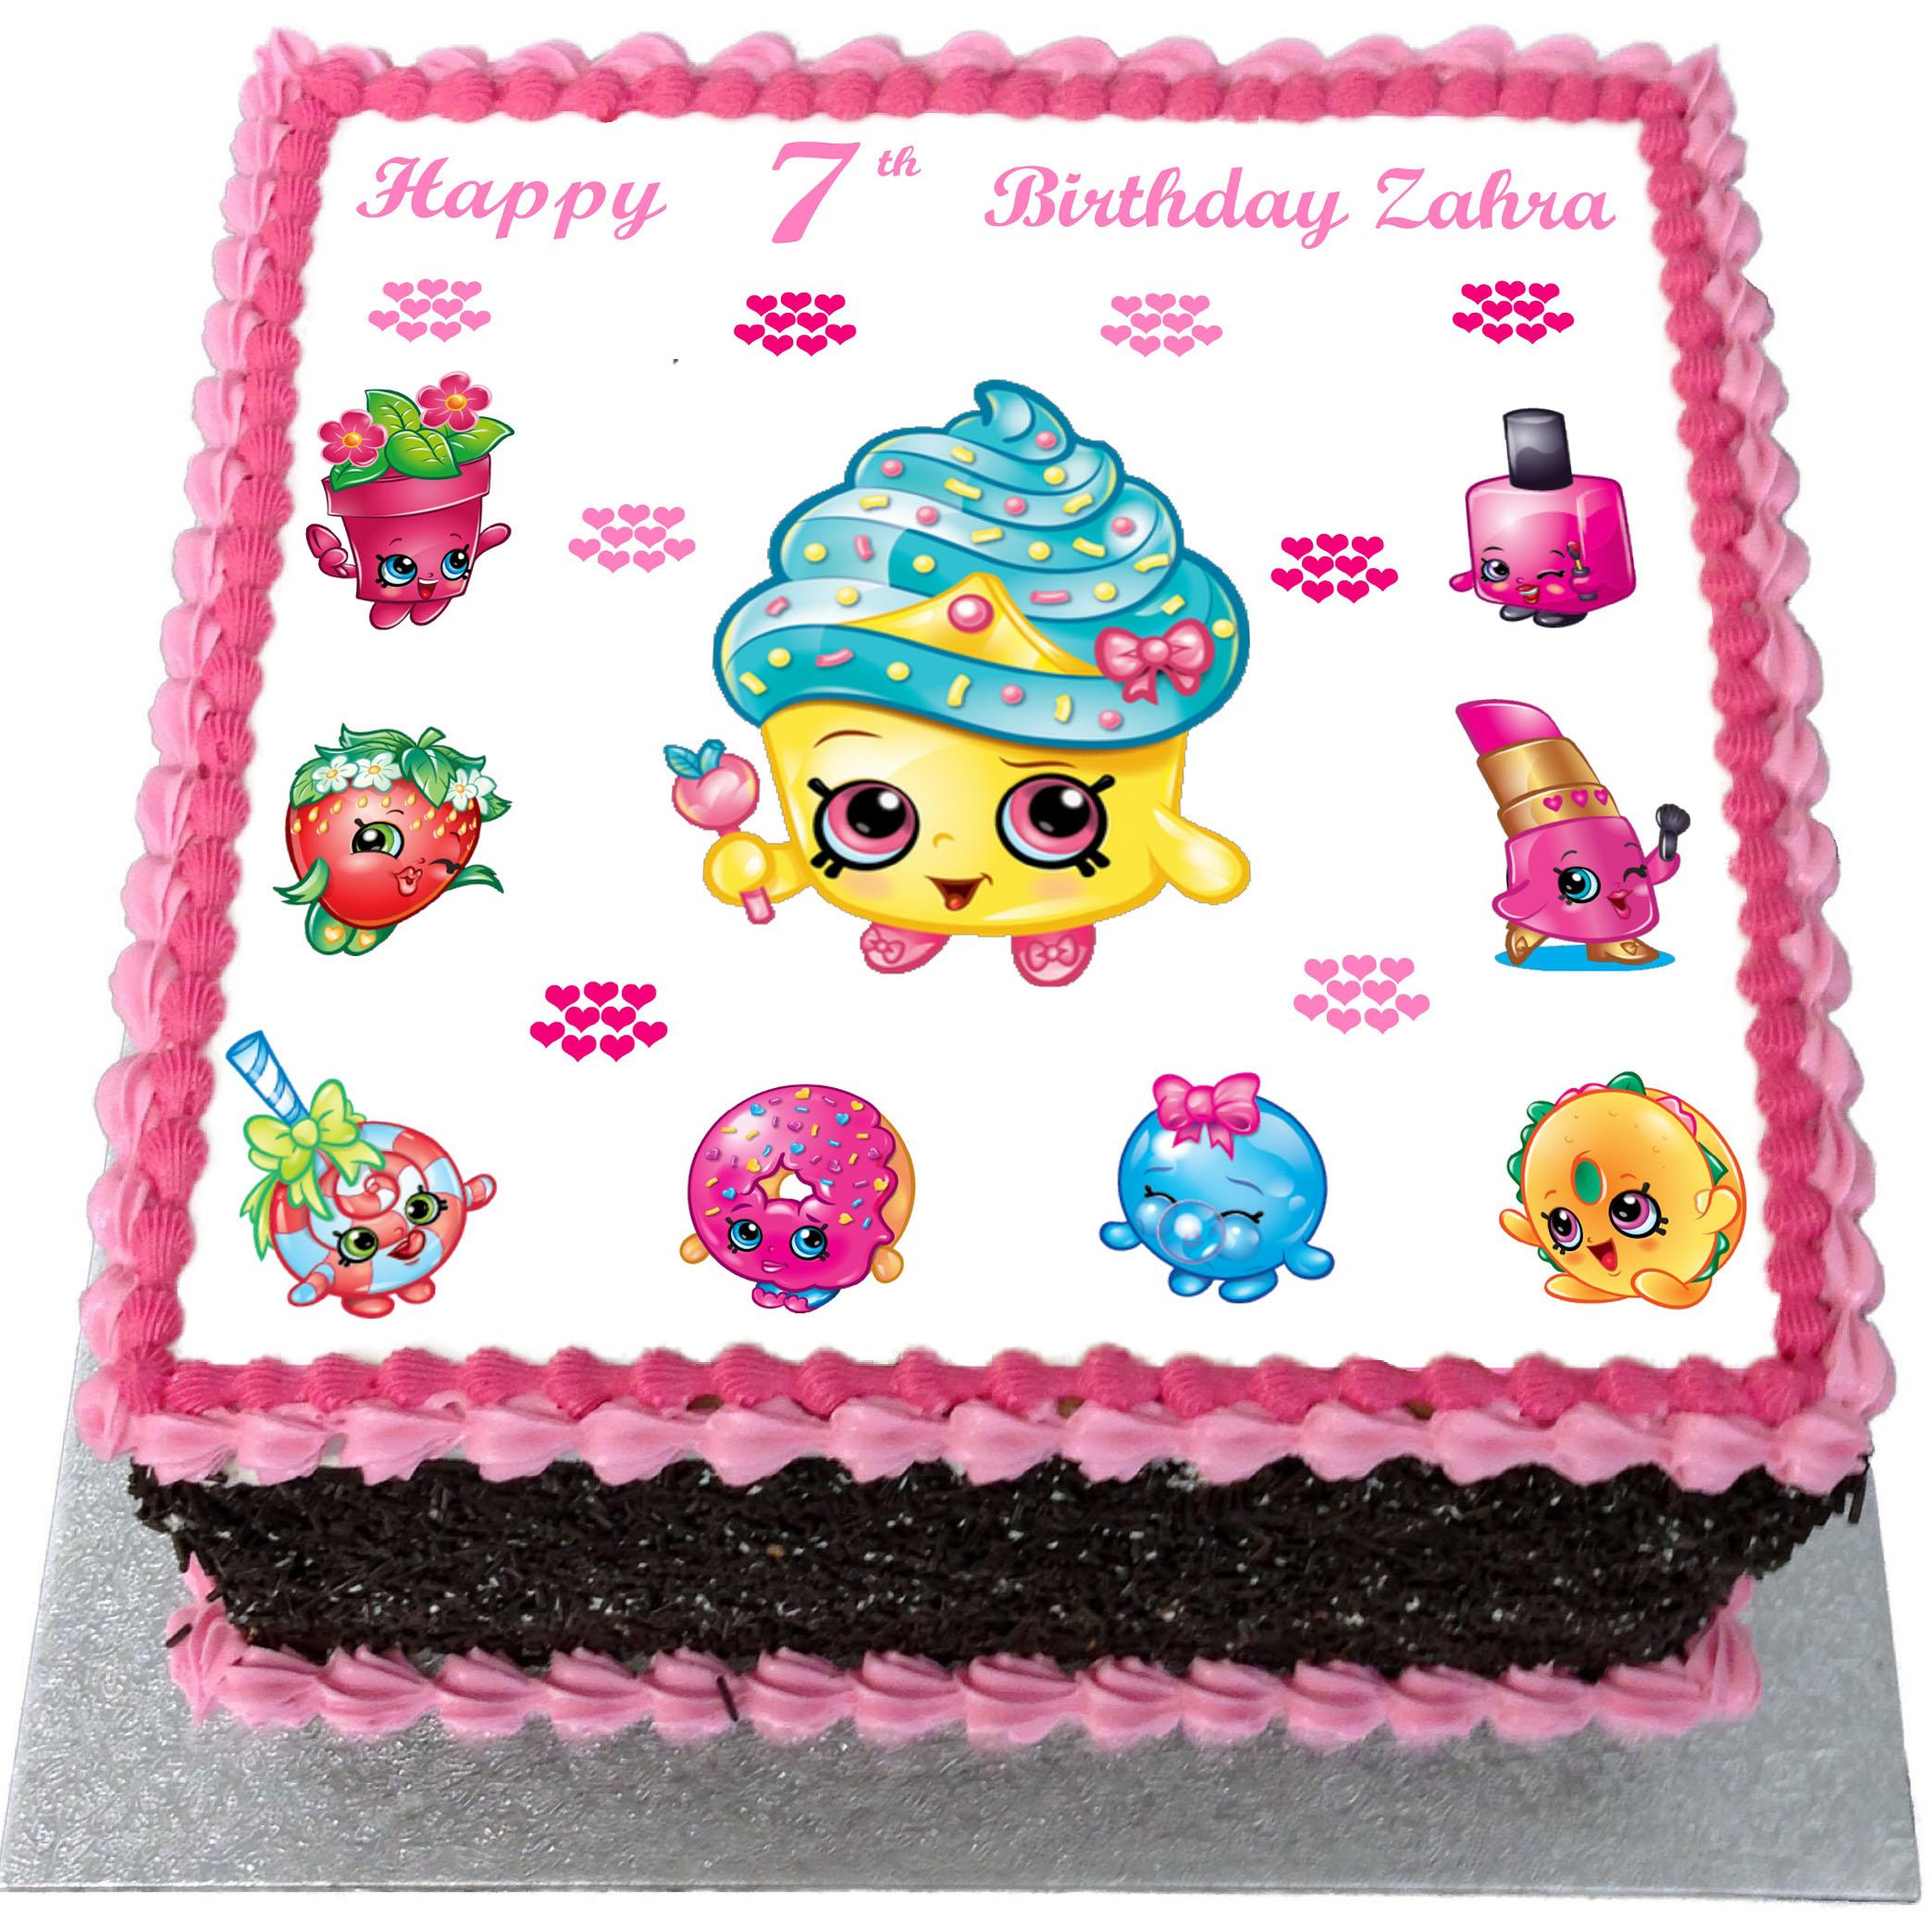 Pleasing Shopkins Birthday Cake Flecks Cakes Personalised Birthday Cards Paralily Jamesorg